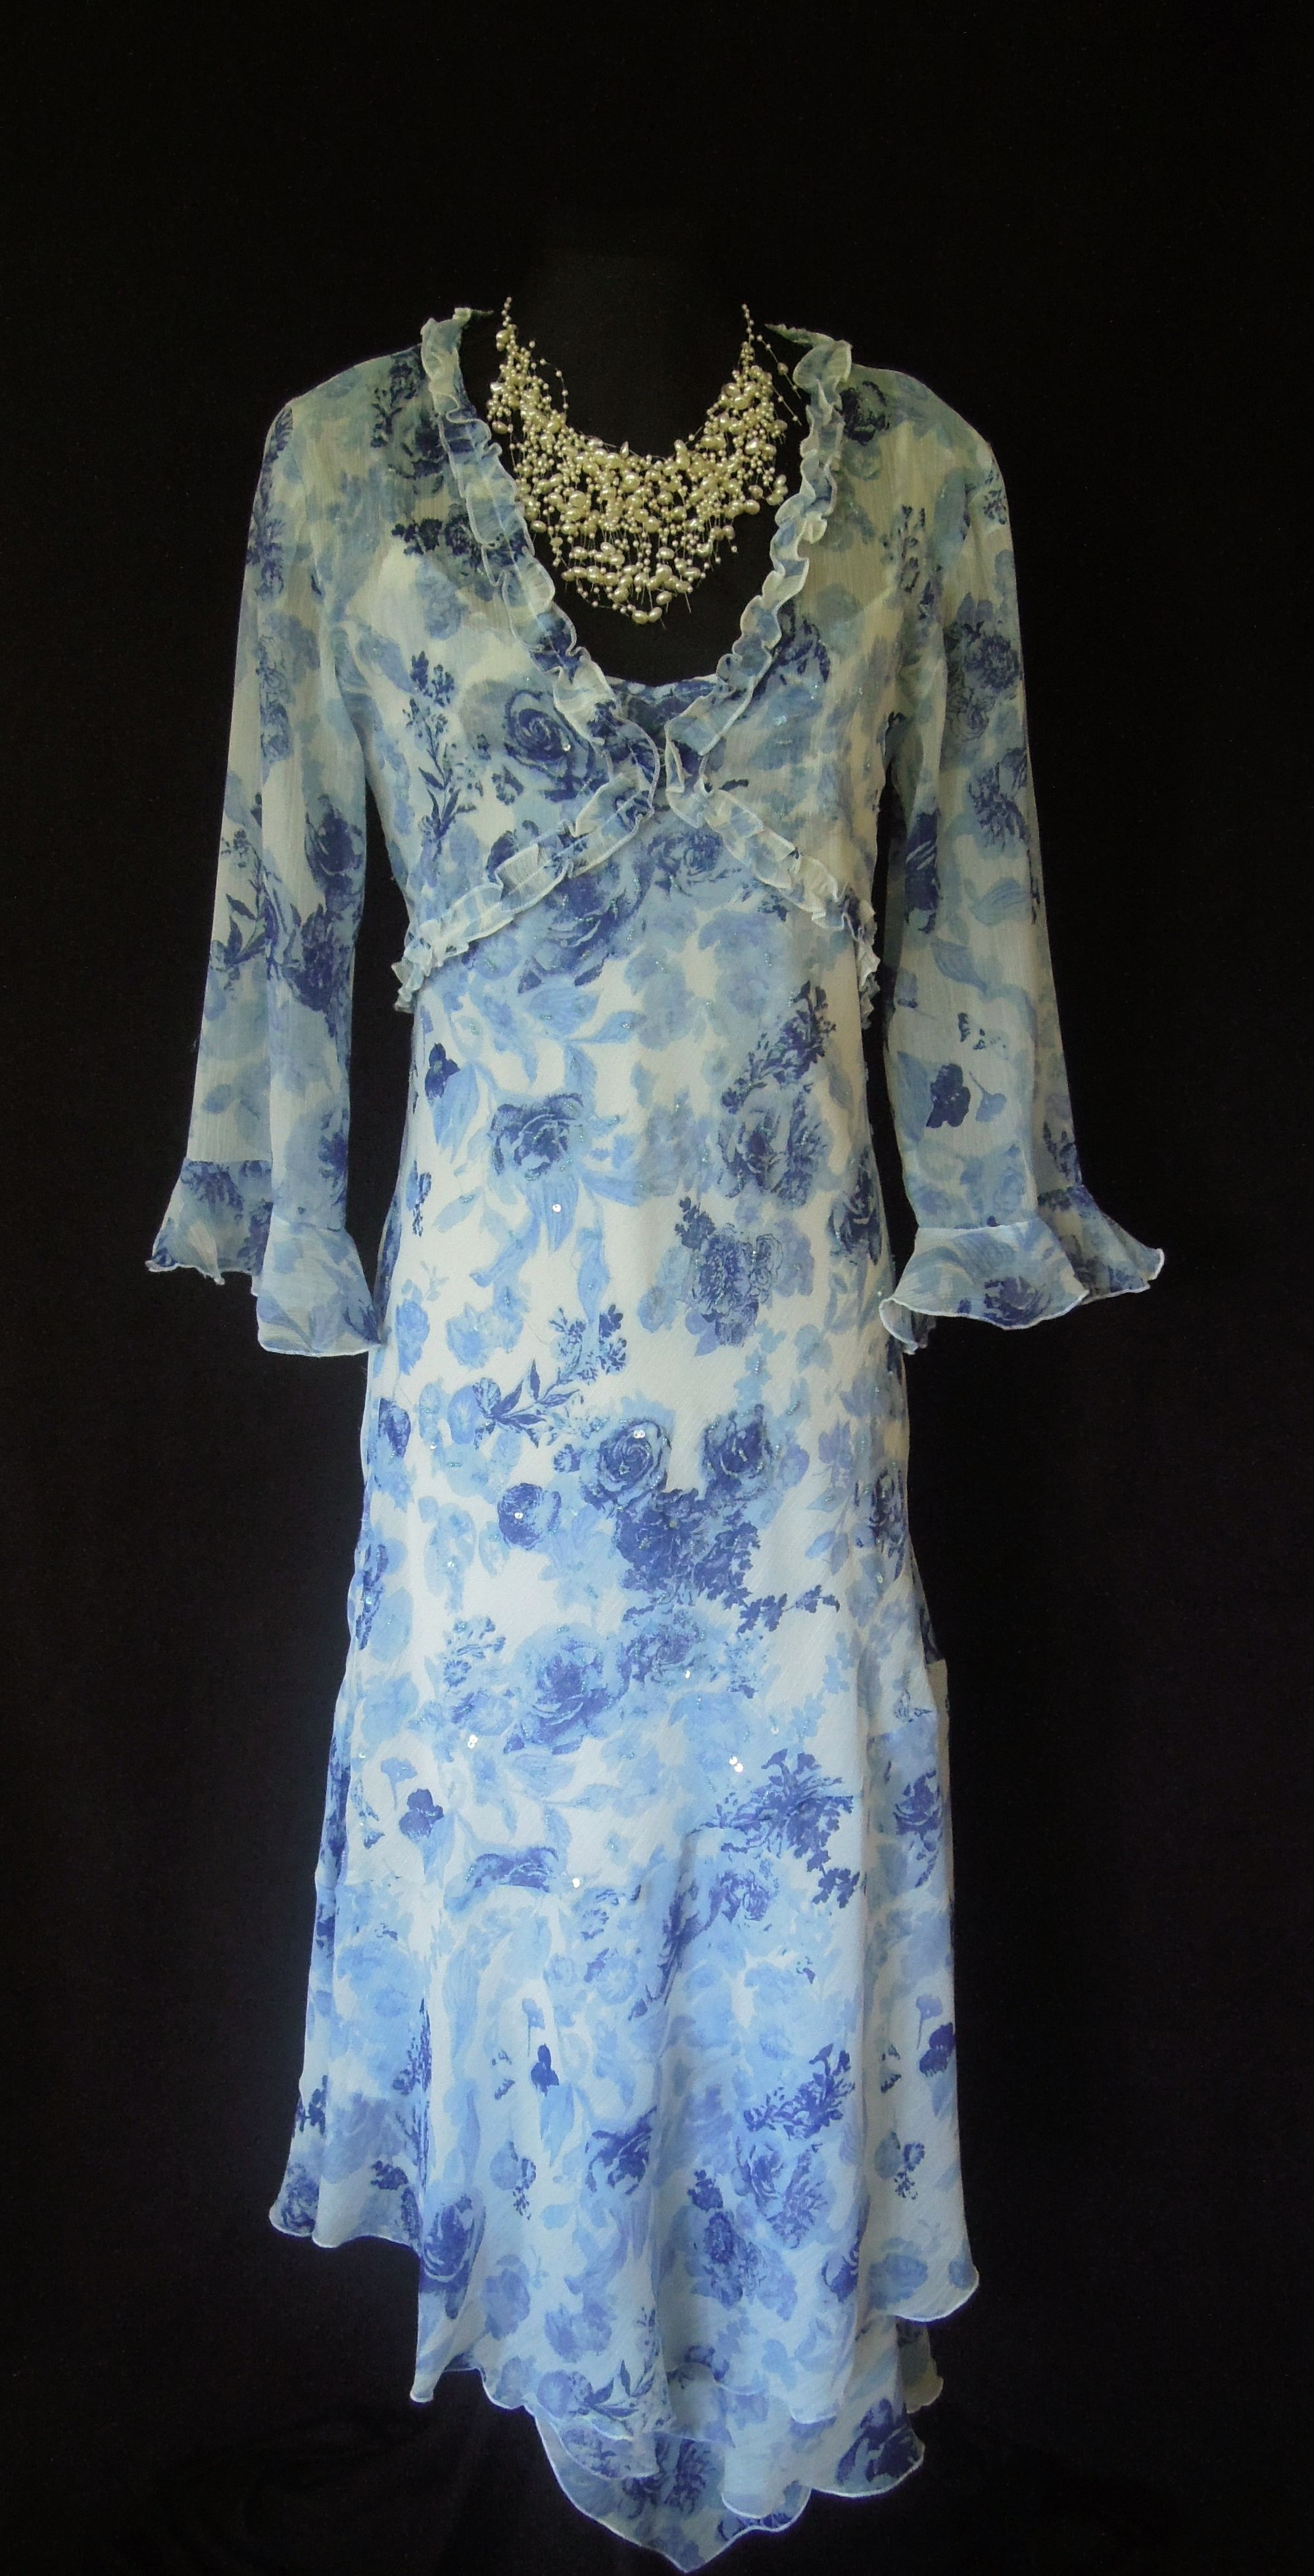 Pomodoro Blue & White Dress & Jacket Size 12. To see more photos ...